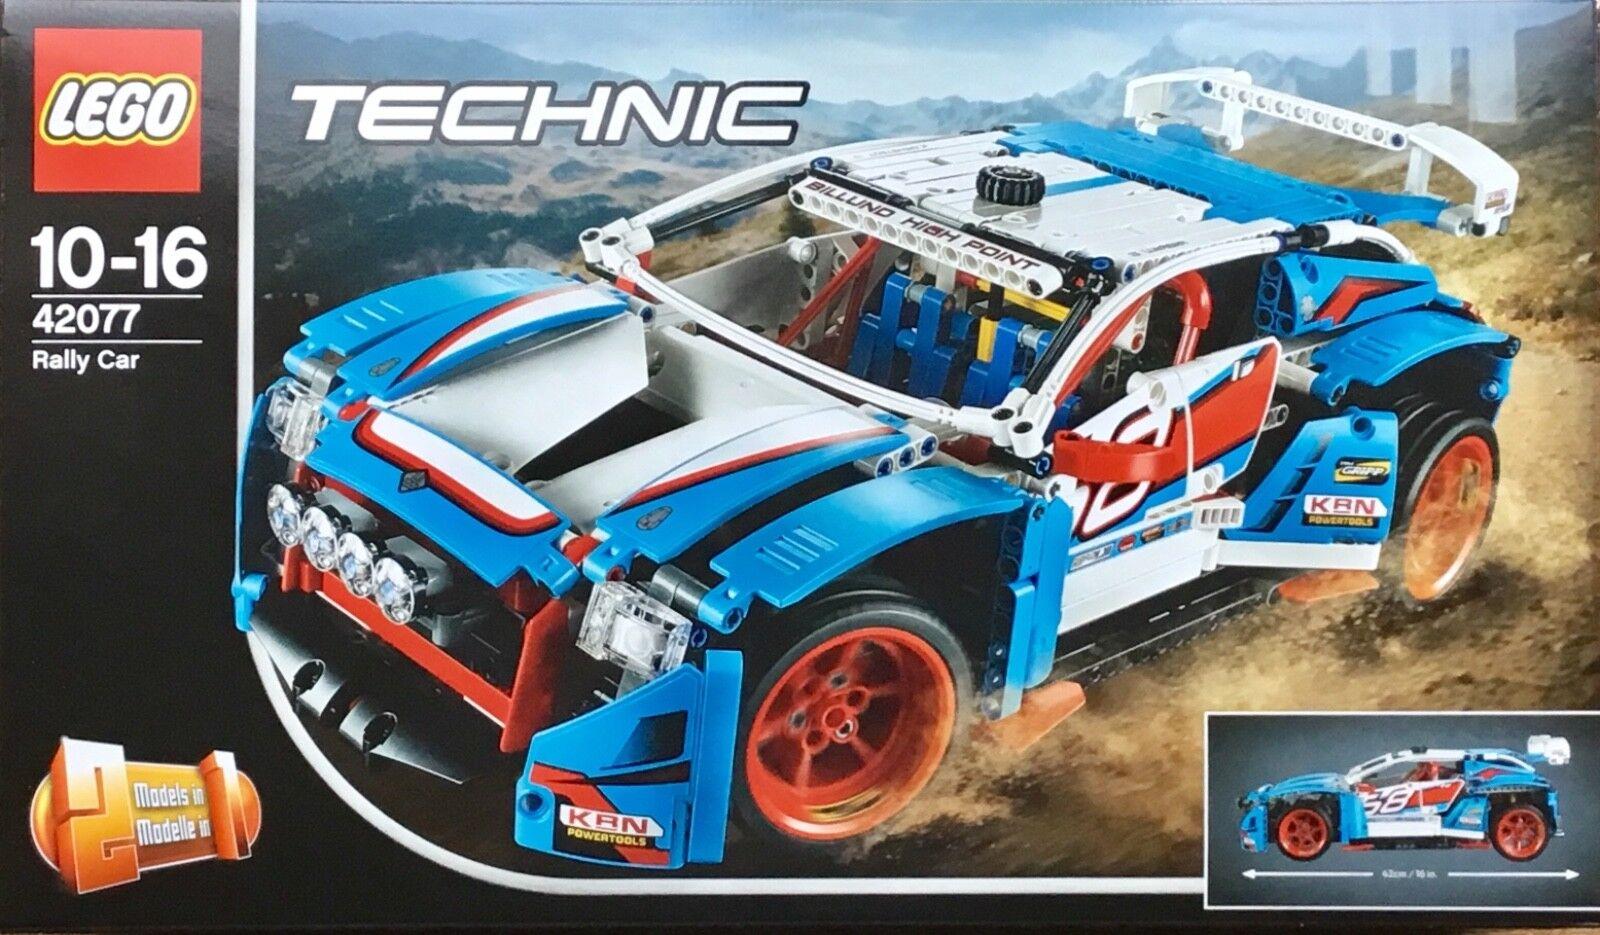 LEGO Technic 42077 RALLY CAR 2018 NEW & SEALED